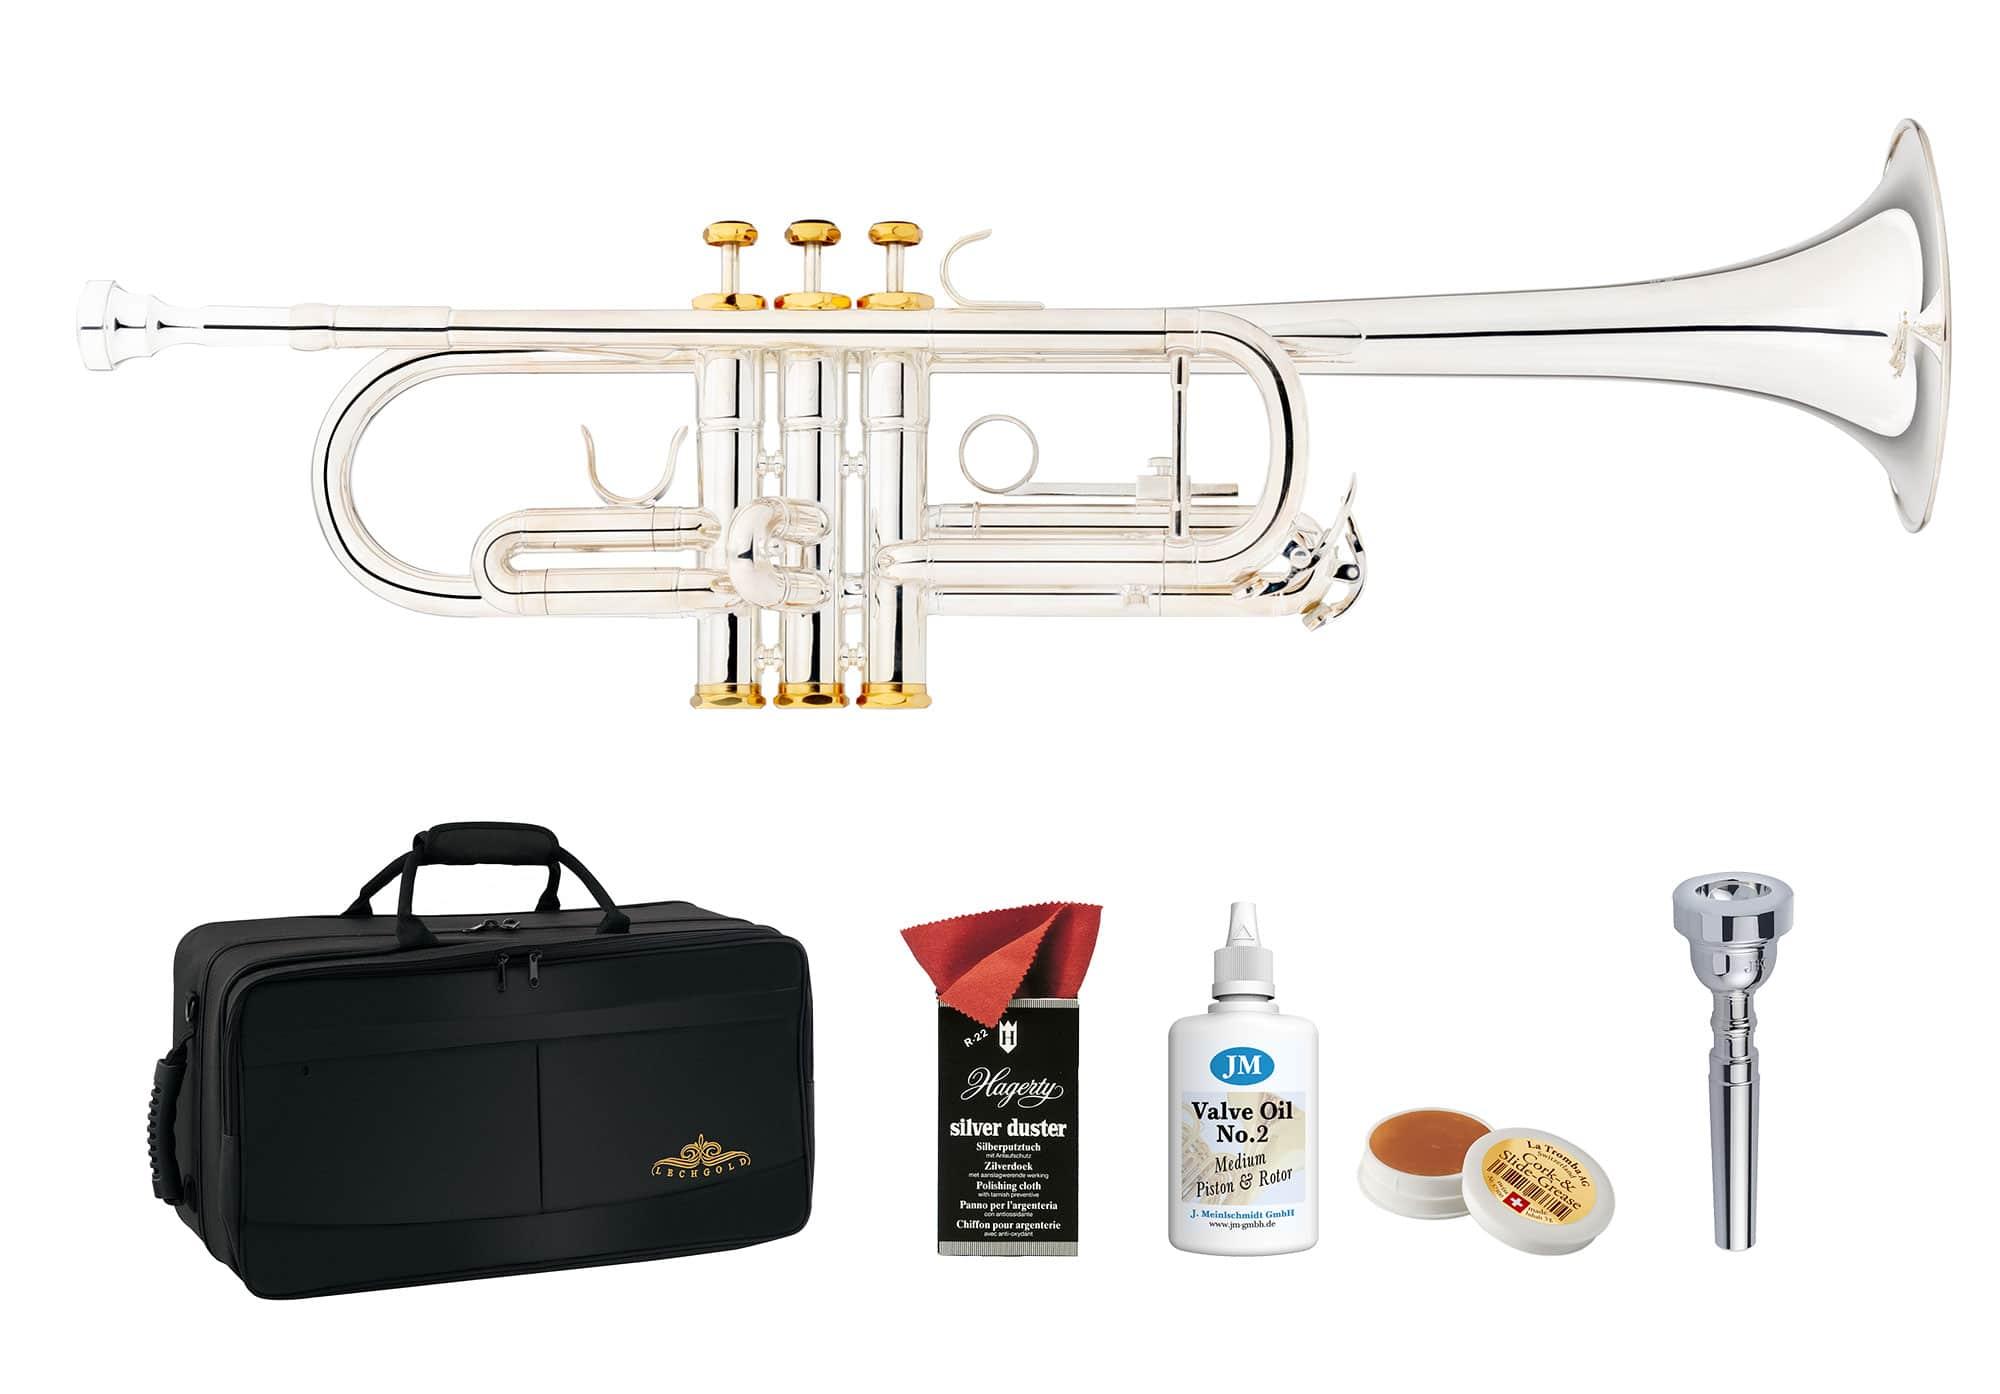 Trompeten - Lechgold CTR 18S C Trompete versilbert Deluxe Set - Onlineshop Musikhaus Kirstein